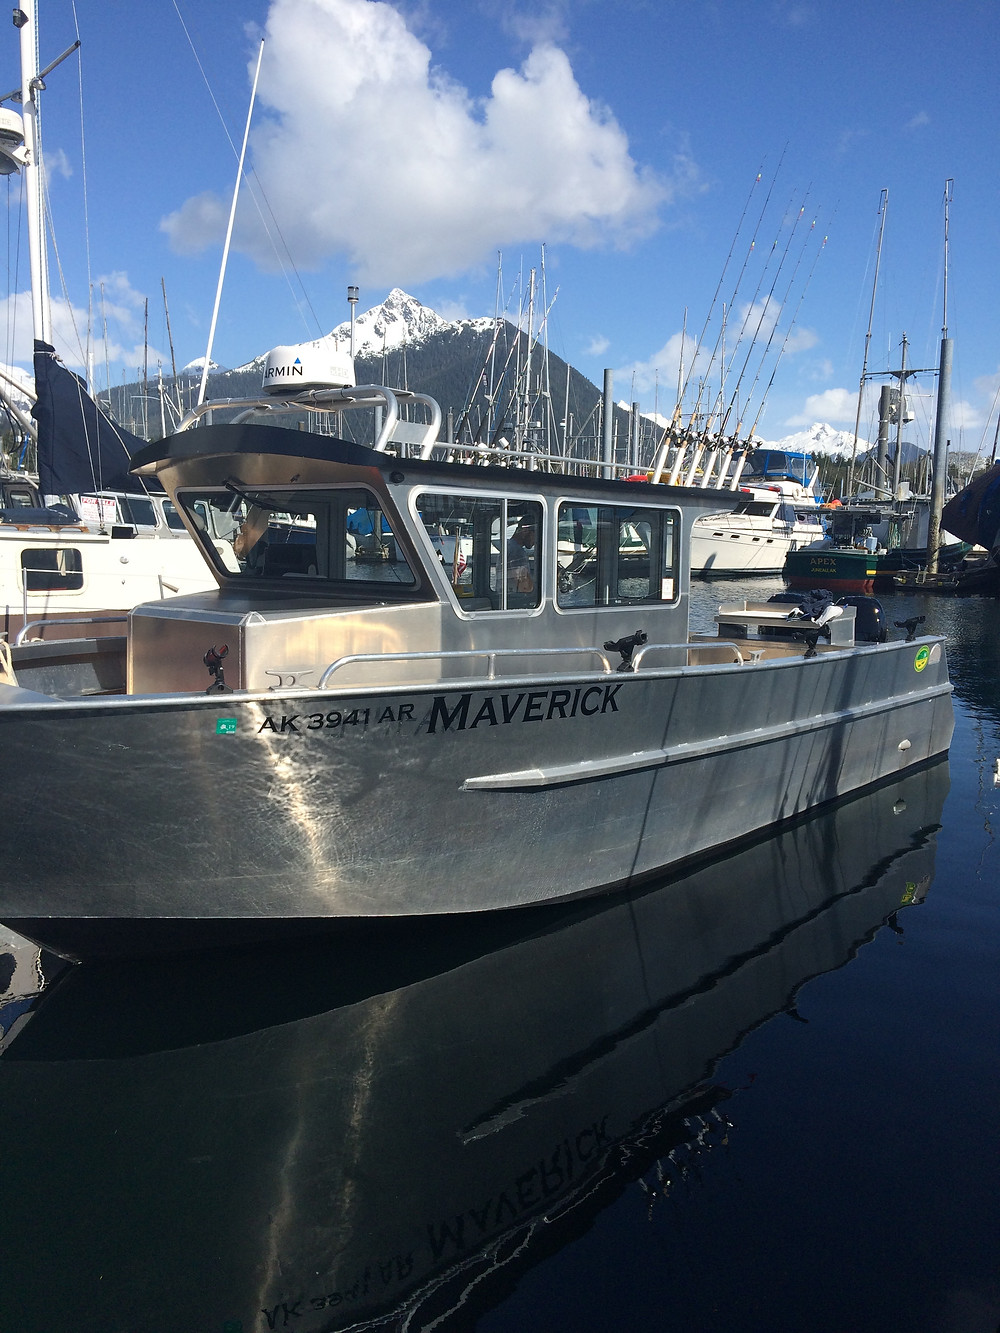 best fishing guides in sitka alaska, best fishing lodges in sitka alaska